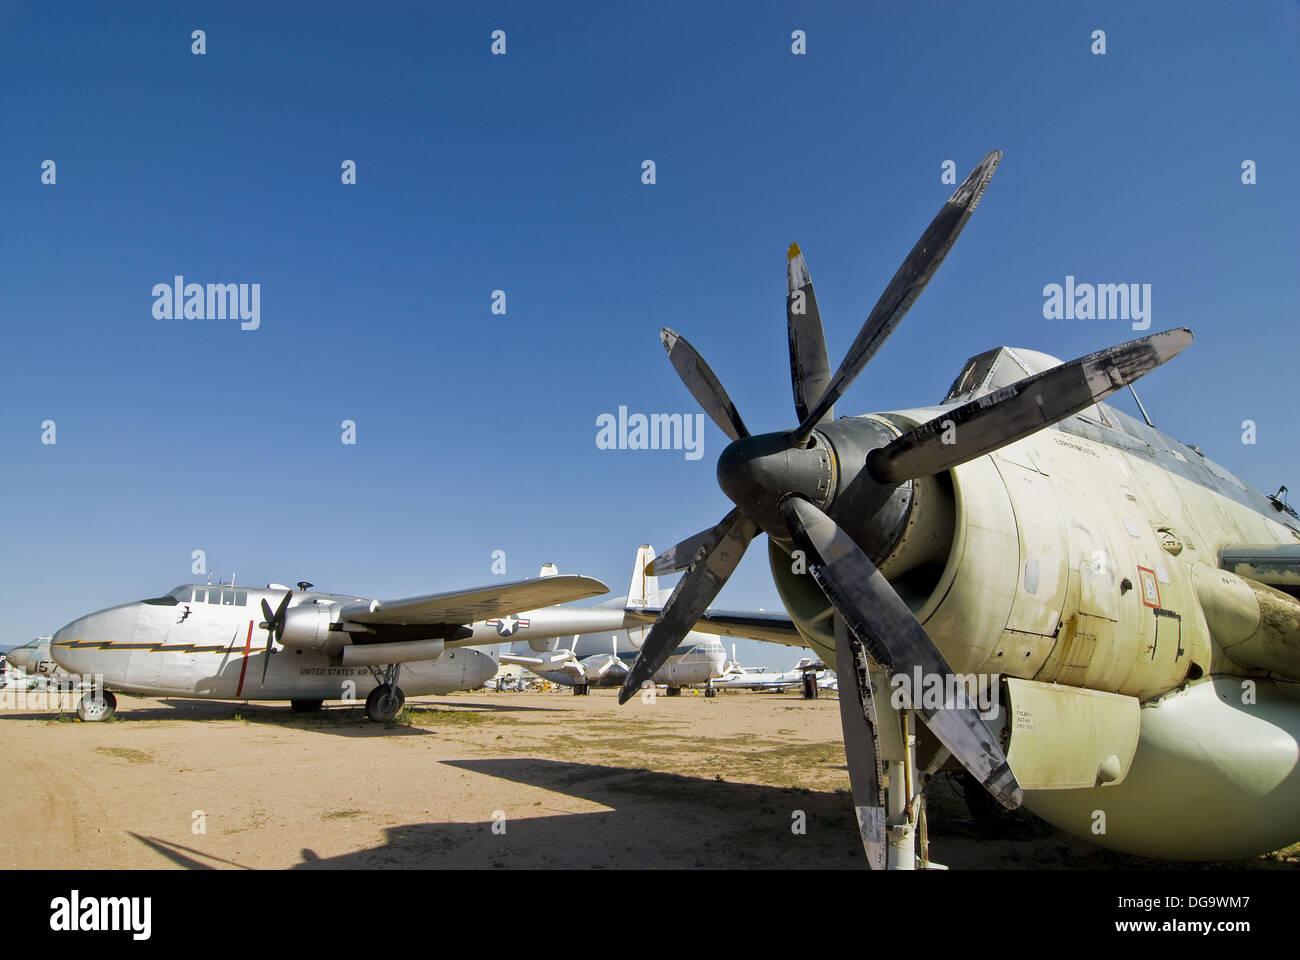 PIMA Air and Space Museum, Tucson, Arizona USA - Stock Image